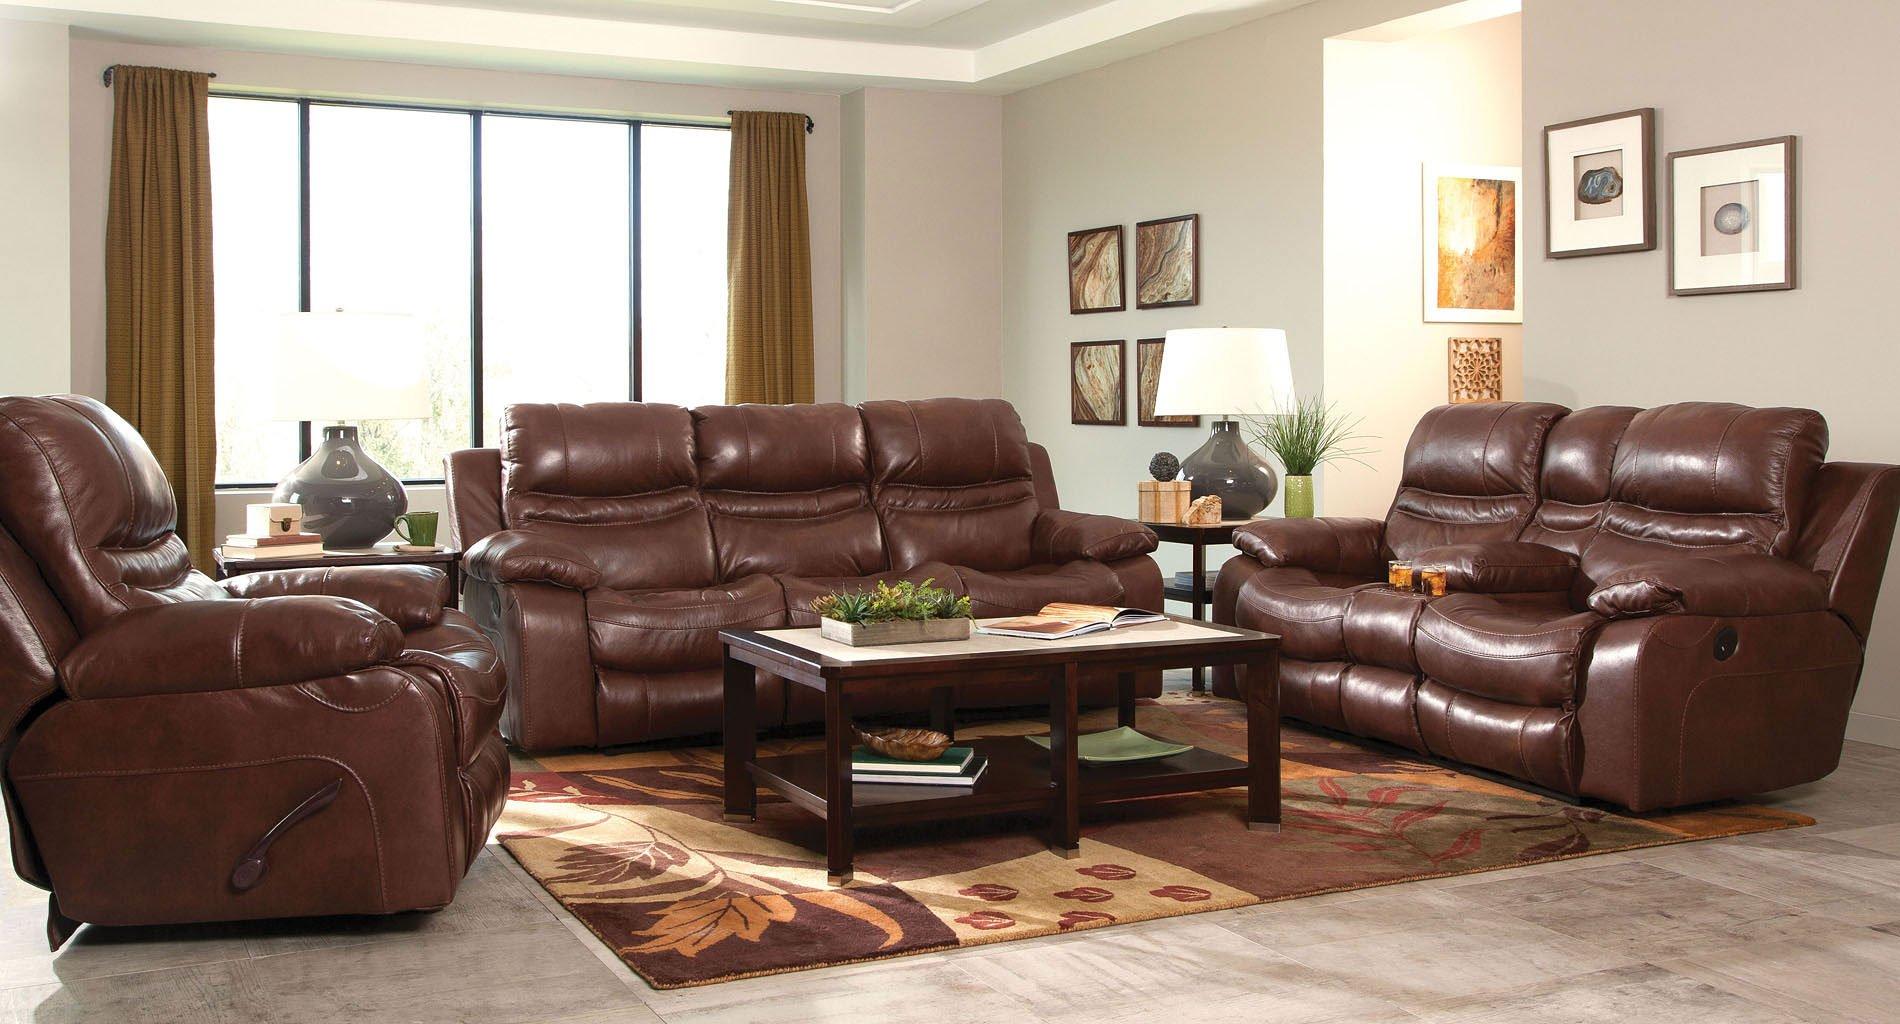 patton lay flat reclining living room set walnut. Black Bedroom Furniture Sets. Home Design Ideas